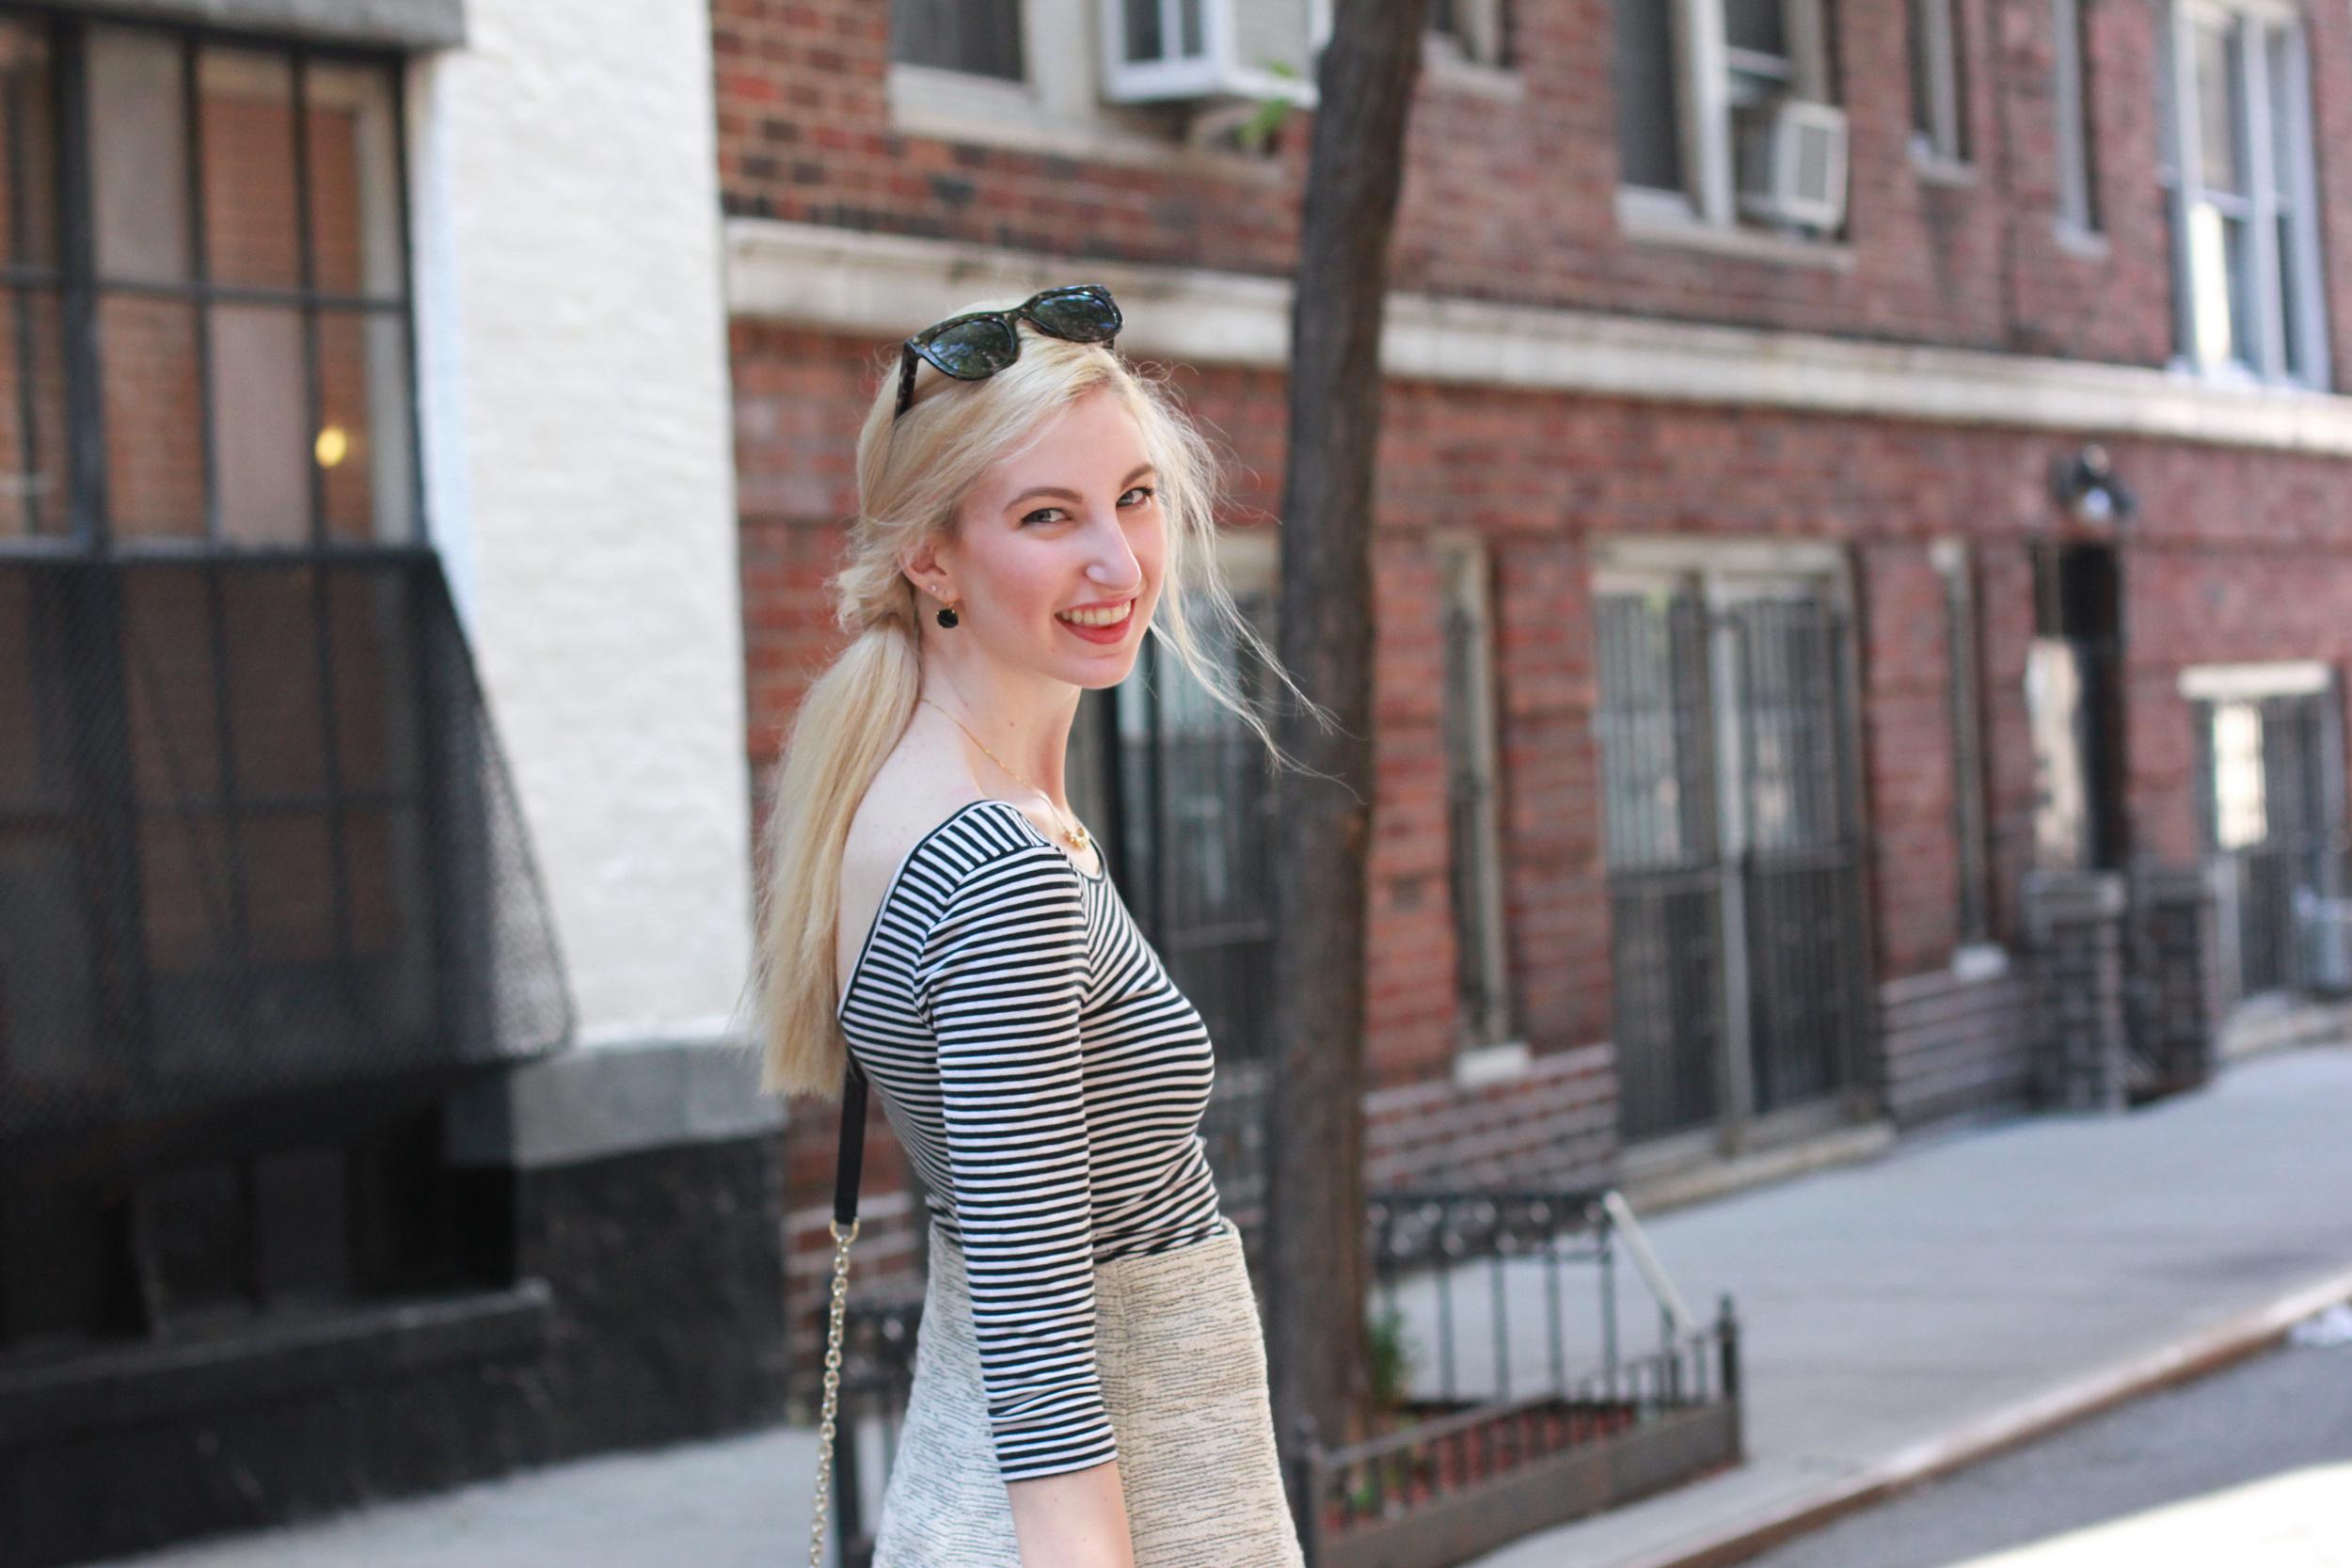 Top -  Similar / Skirt -  LOFT / Bag -  Similar / Flats -  Similar / Earrings -  Kate Spade / Bracelet -  Kendra Scott